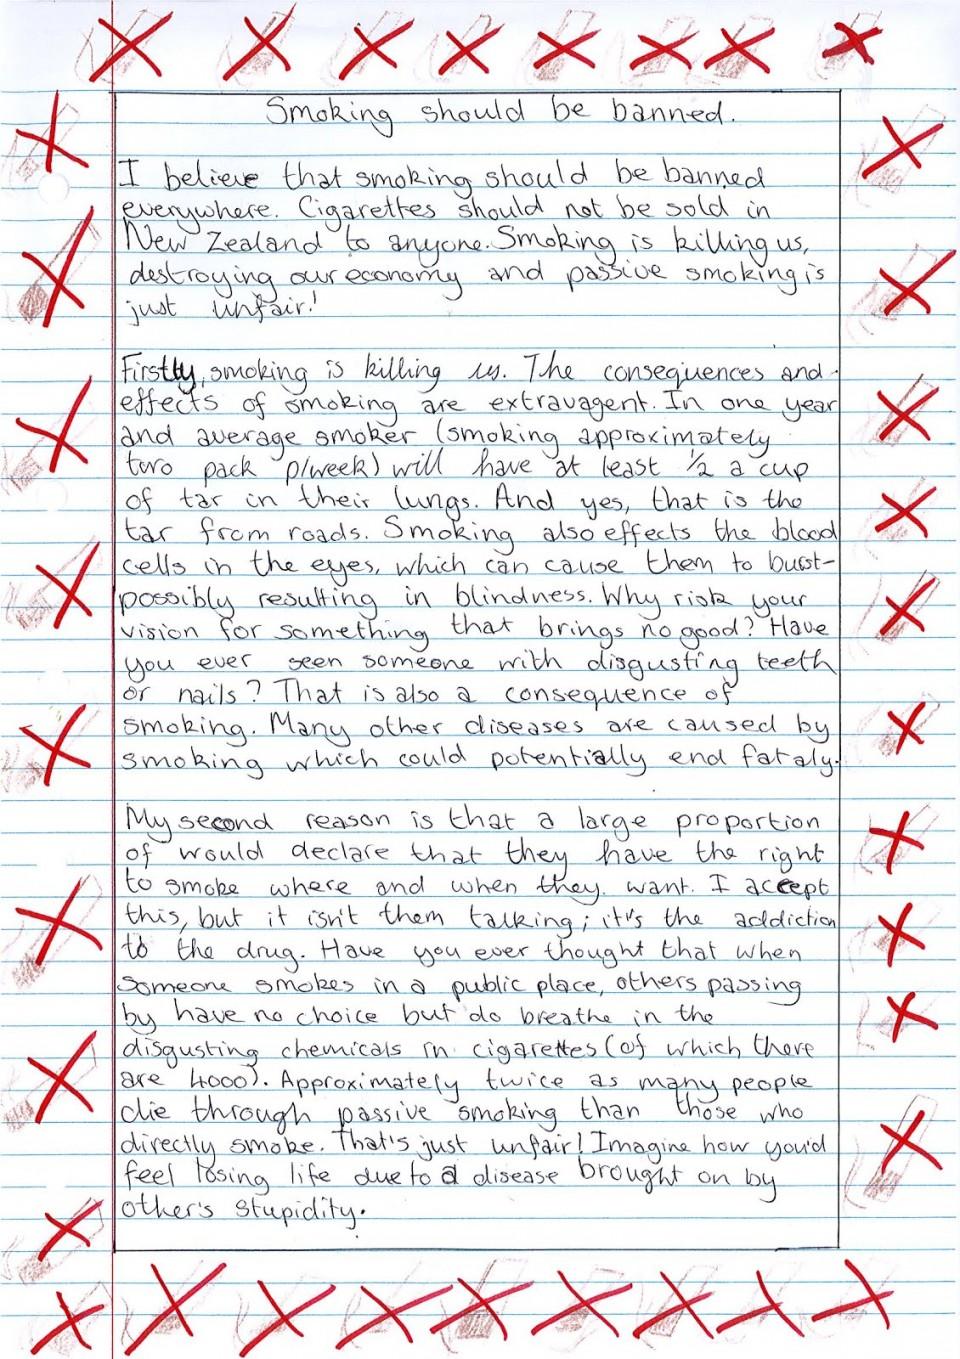 002 Examination Should Abolished Essay Example Smoklng1 Surprising Be Public At School Level Not 960